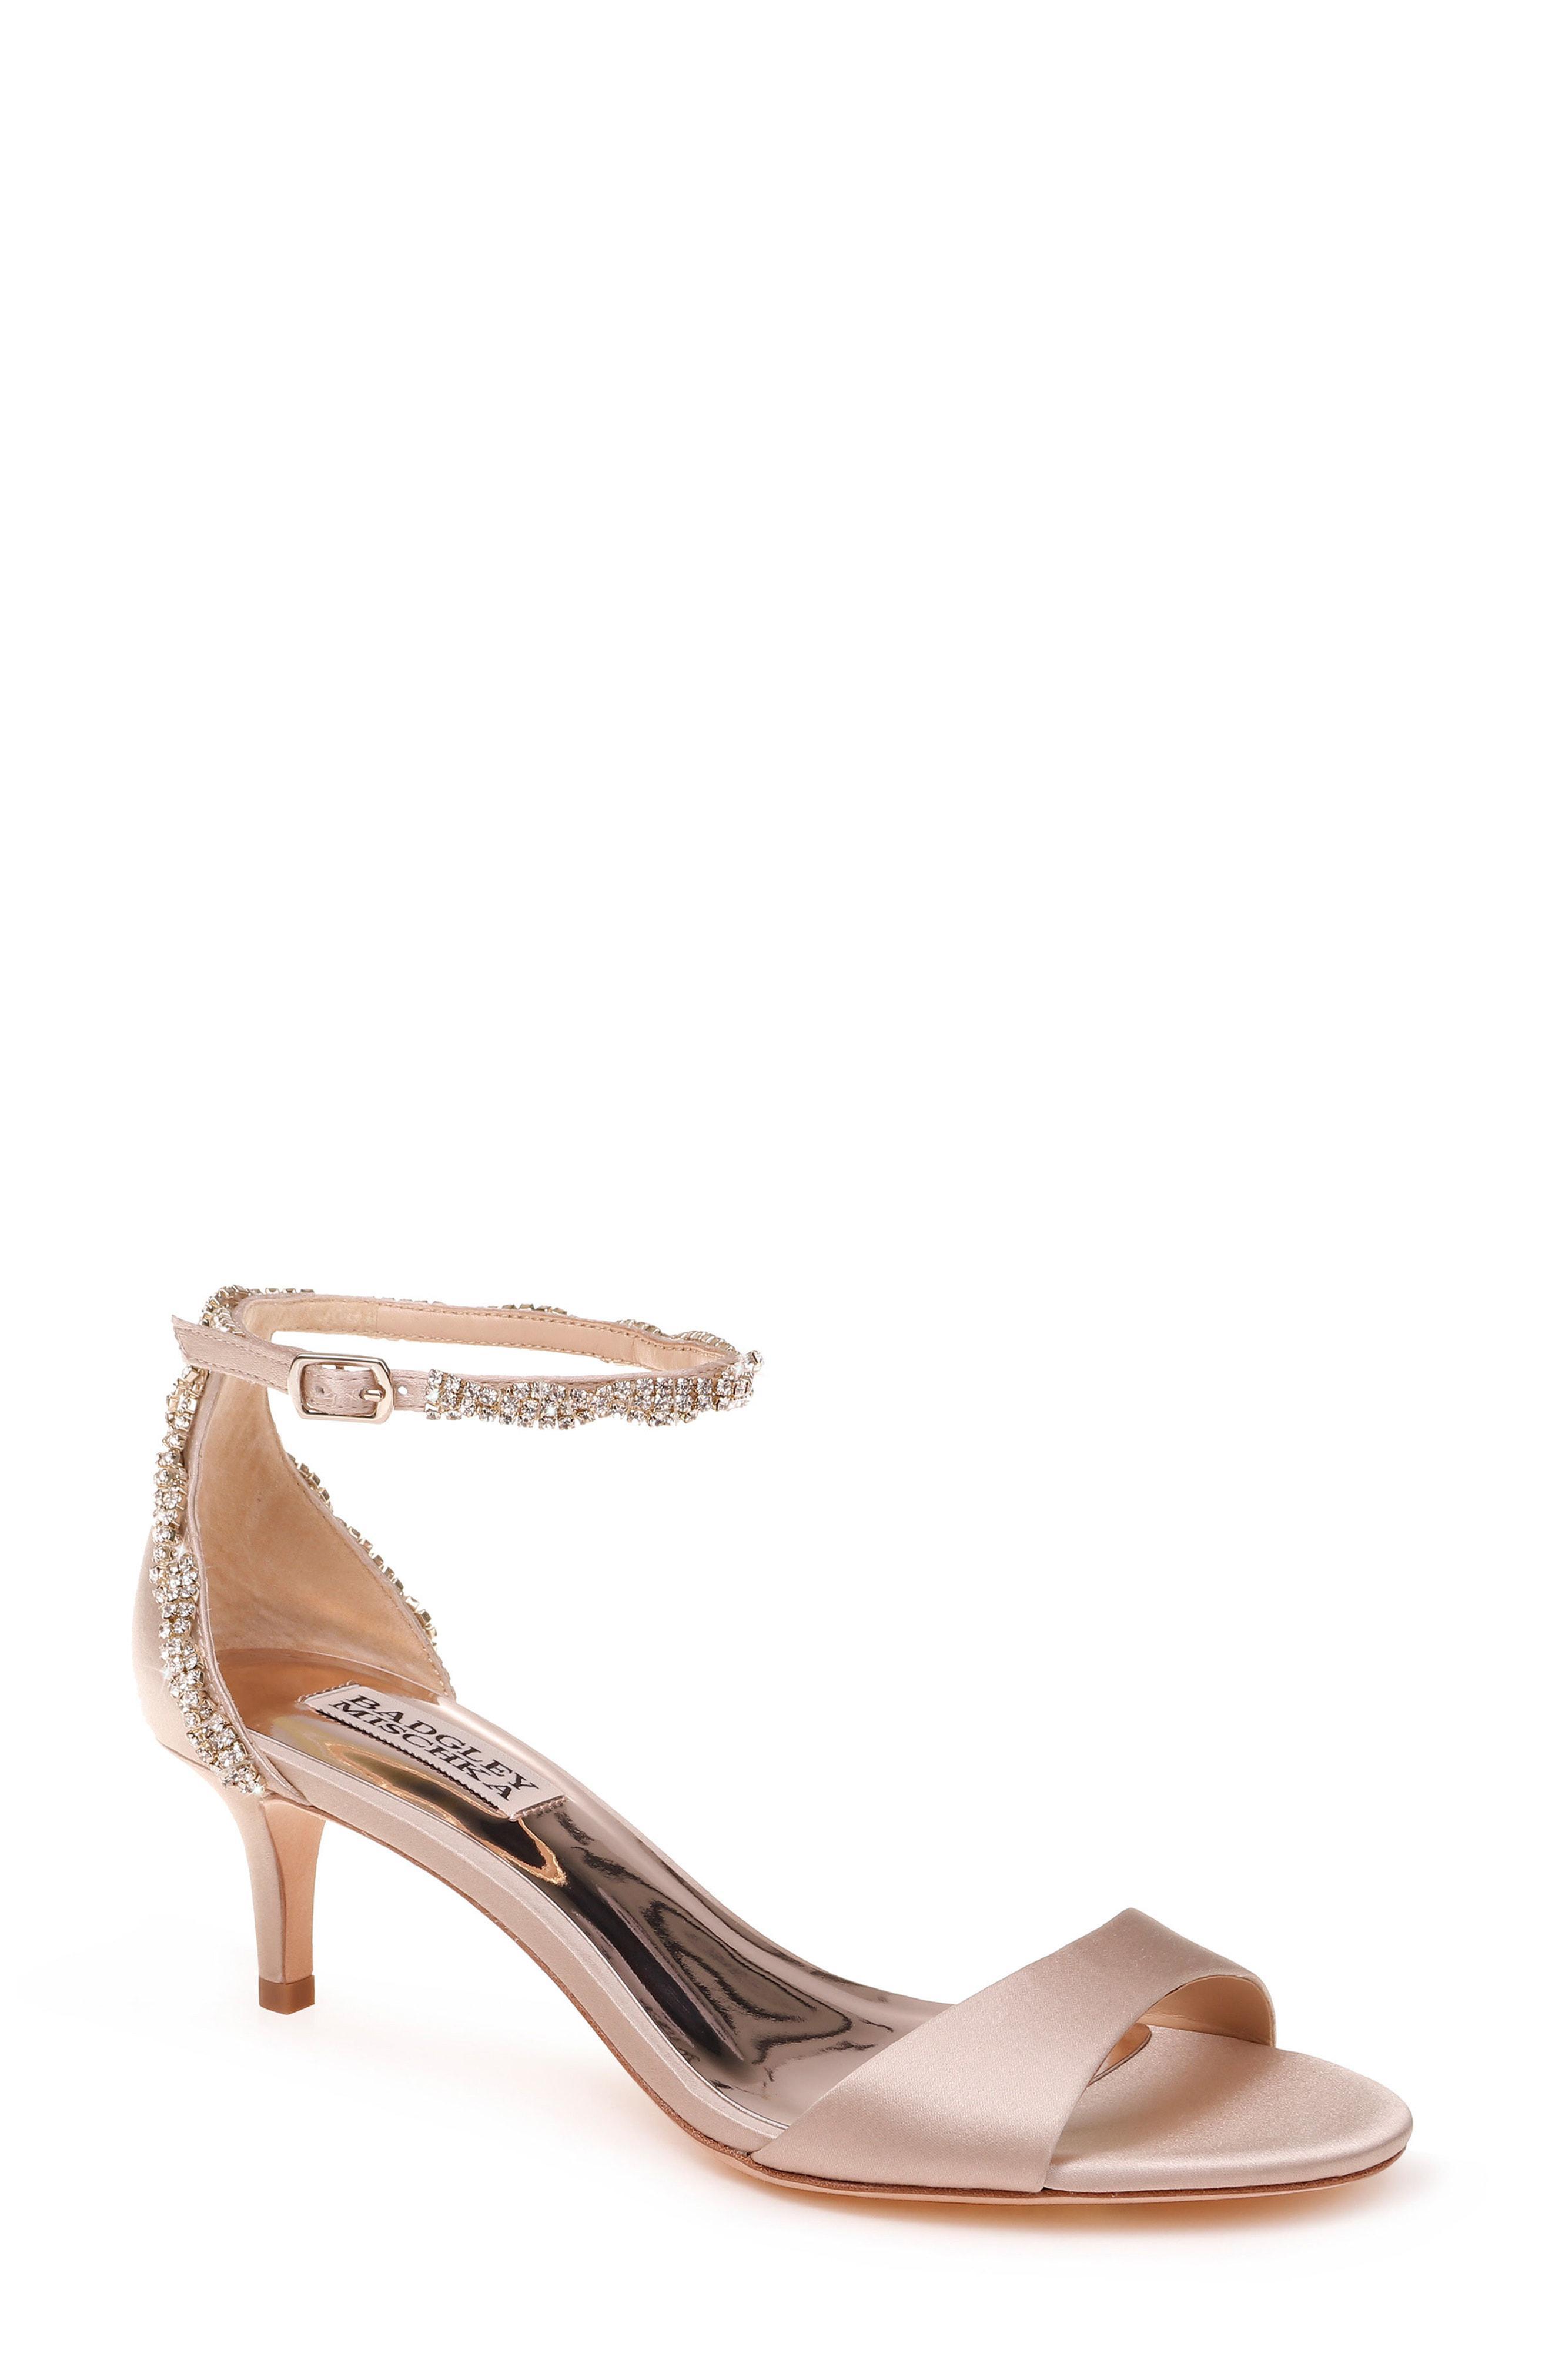 429a0bcafc8 Lyst - Badgley Mischka Yareli Crystal Embellished Sandal in Pink